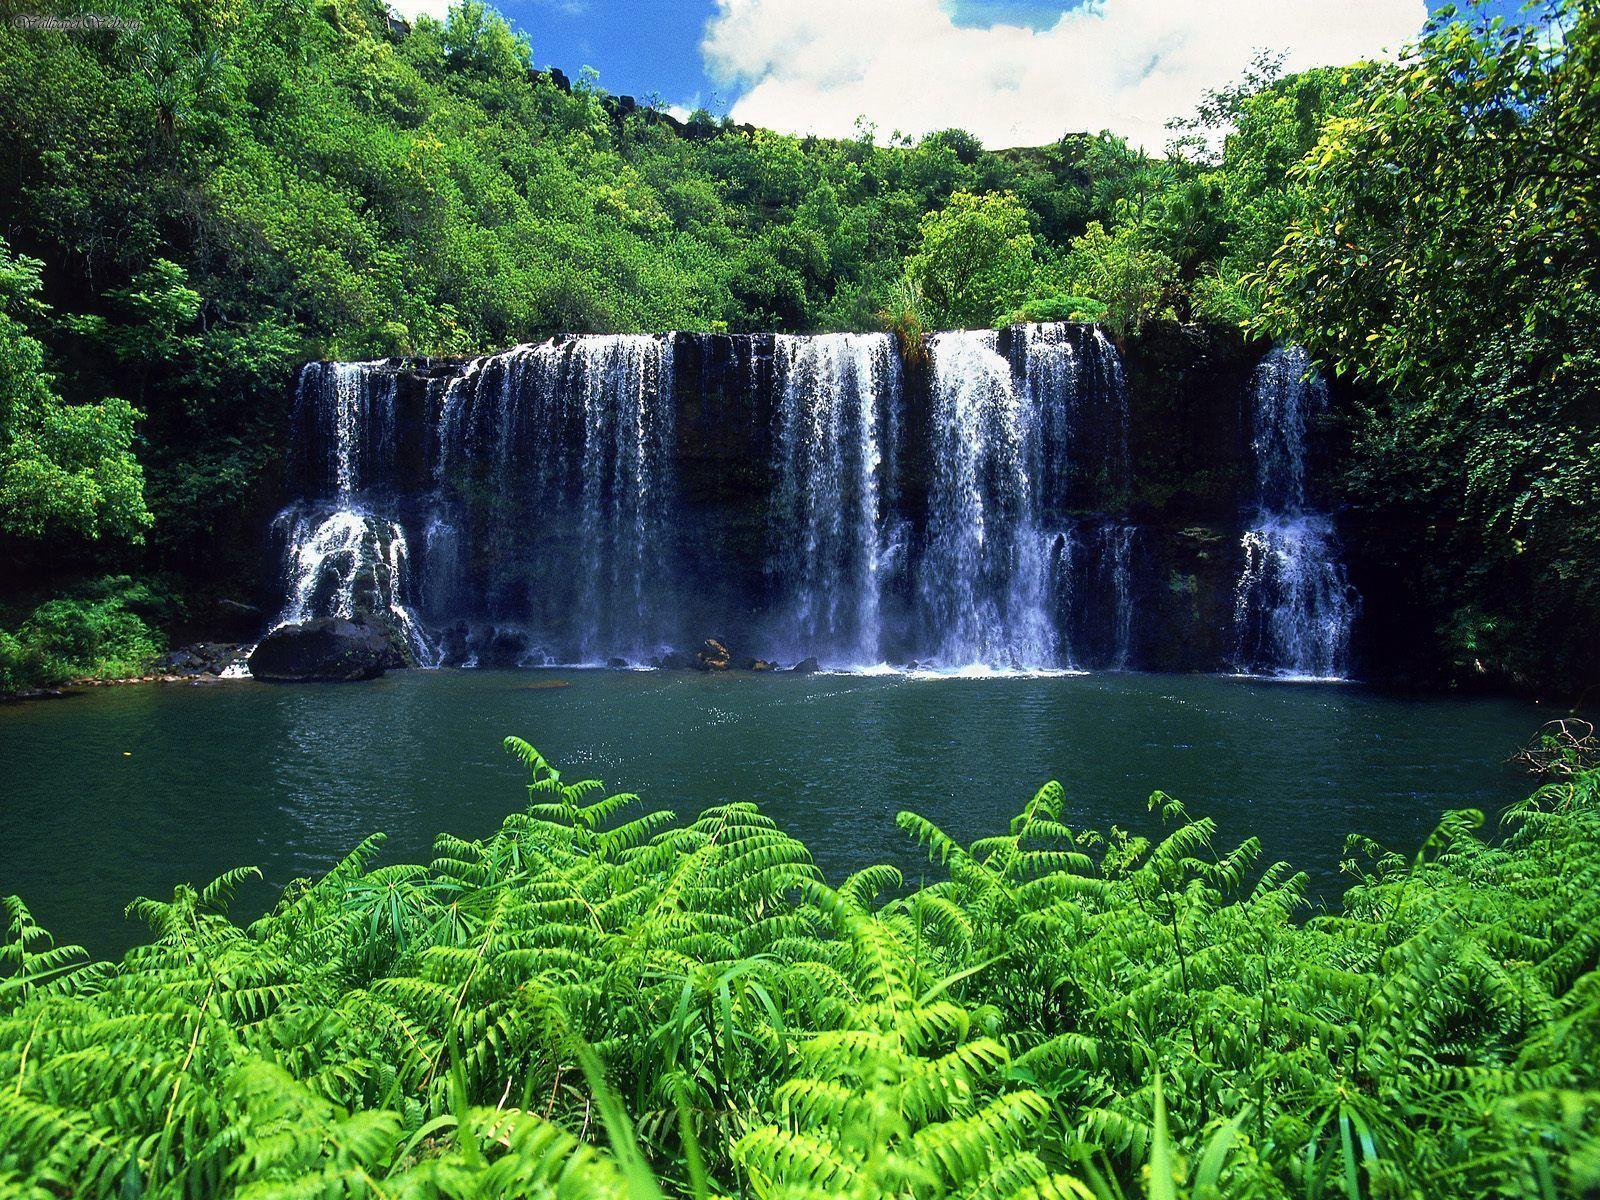 Kauai The Garden Island Wallpaper Kauai Waterfalls Kauai Waterfalls Hawaiian Waterfall Beautiful Waterfalls